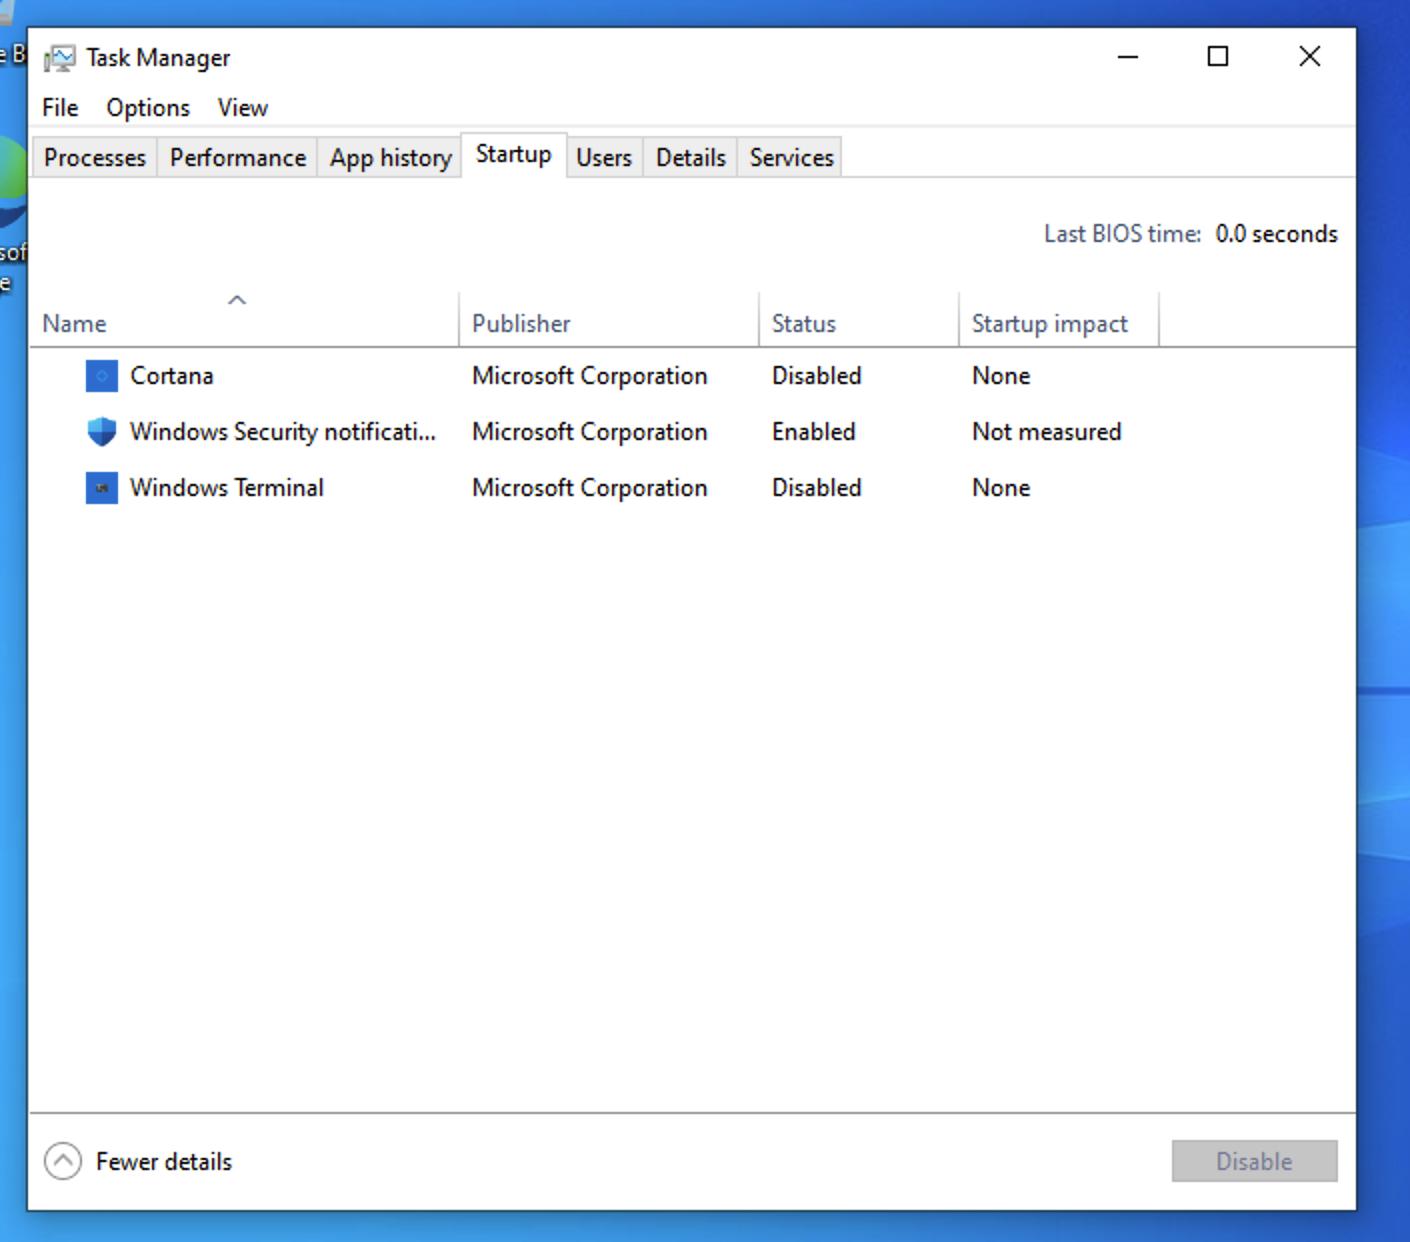 Windows 10 Screenshot of Task Manager